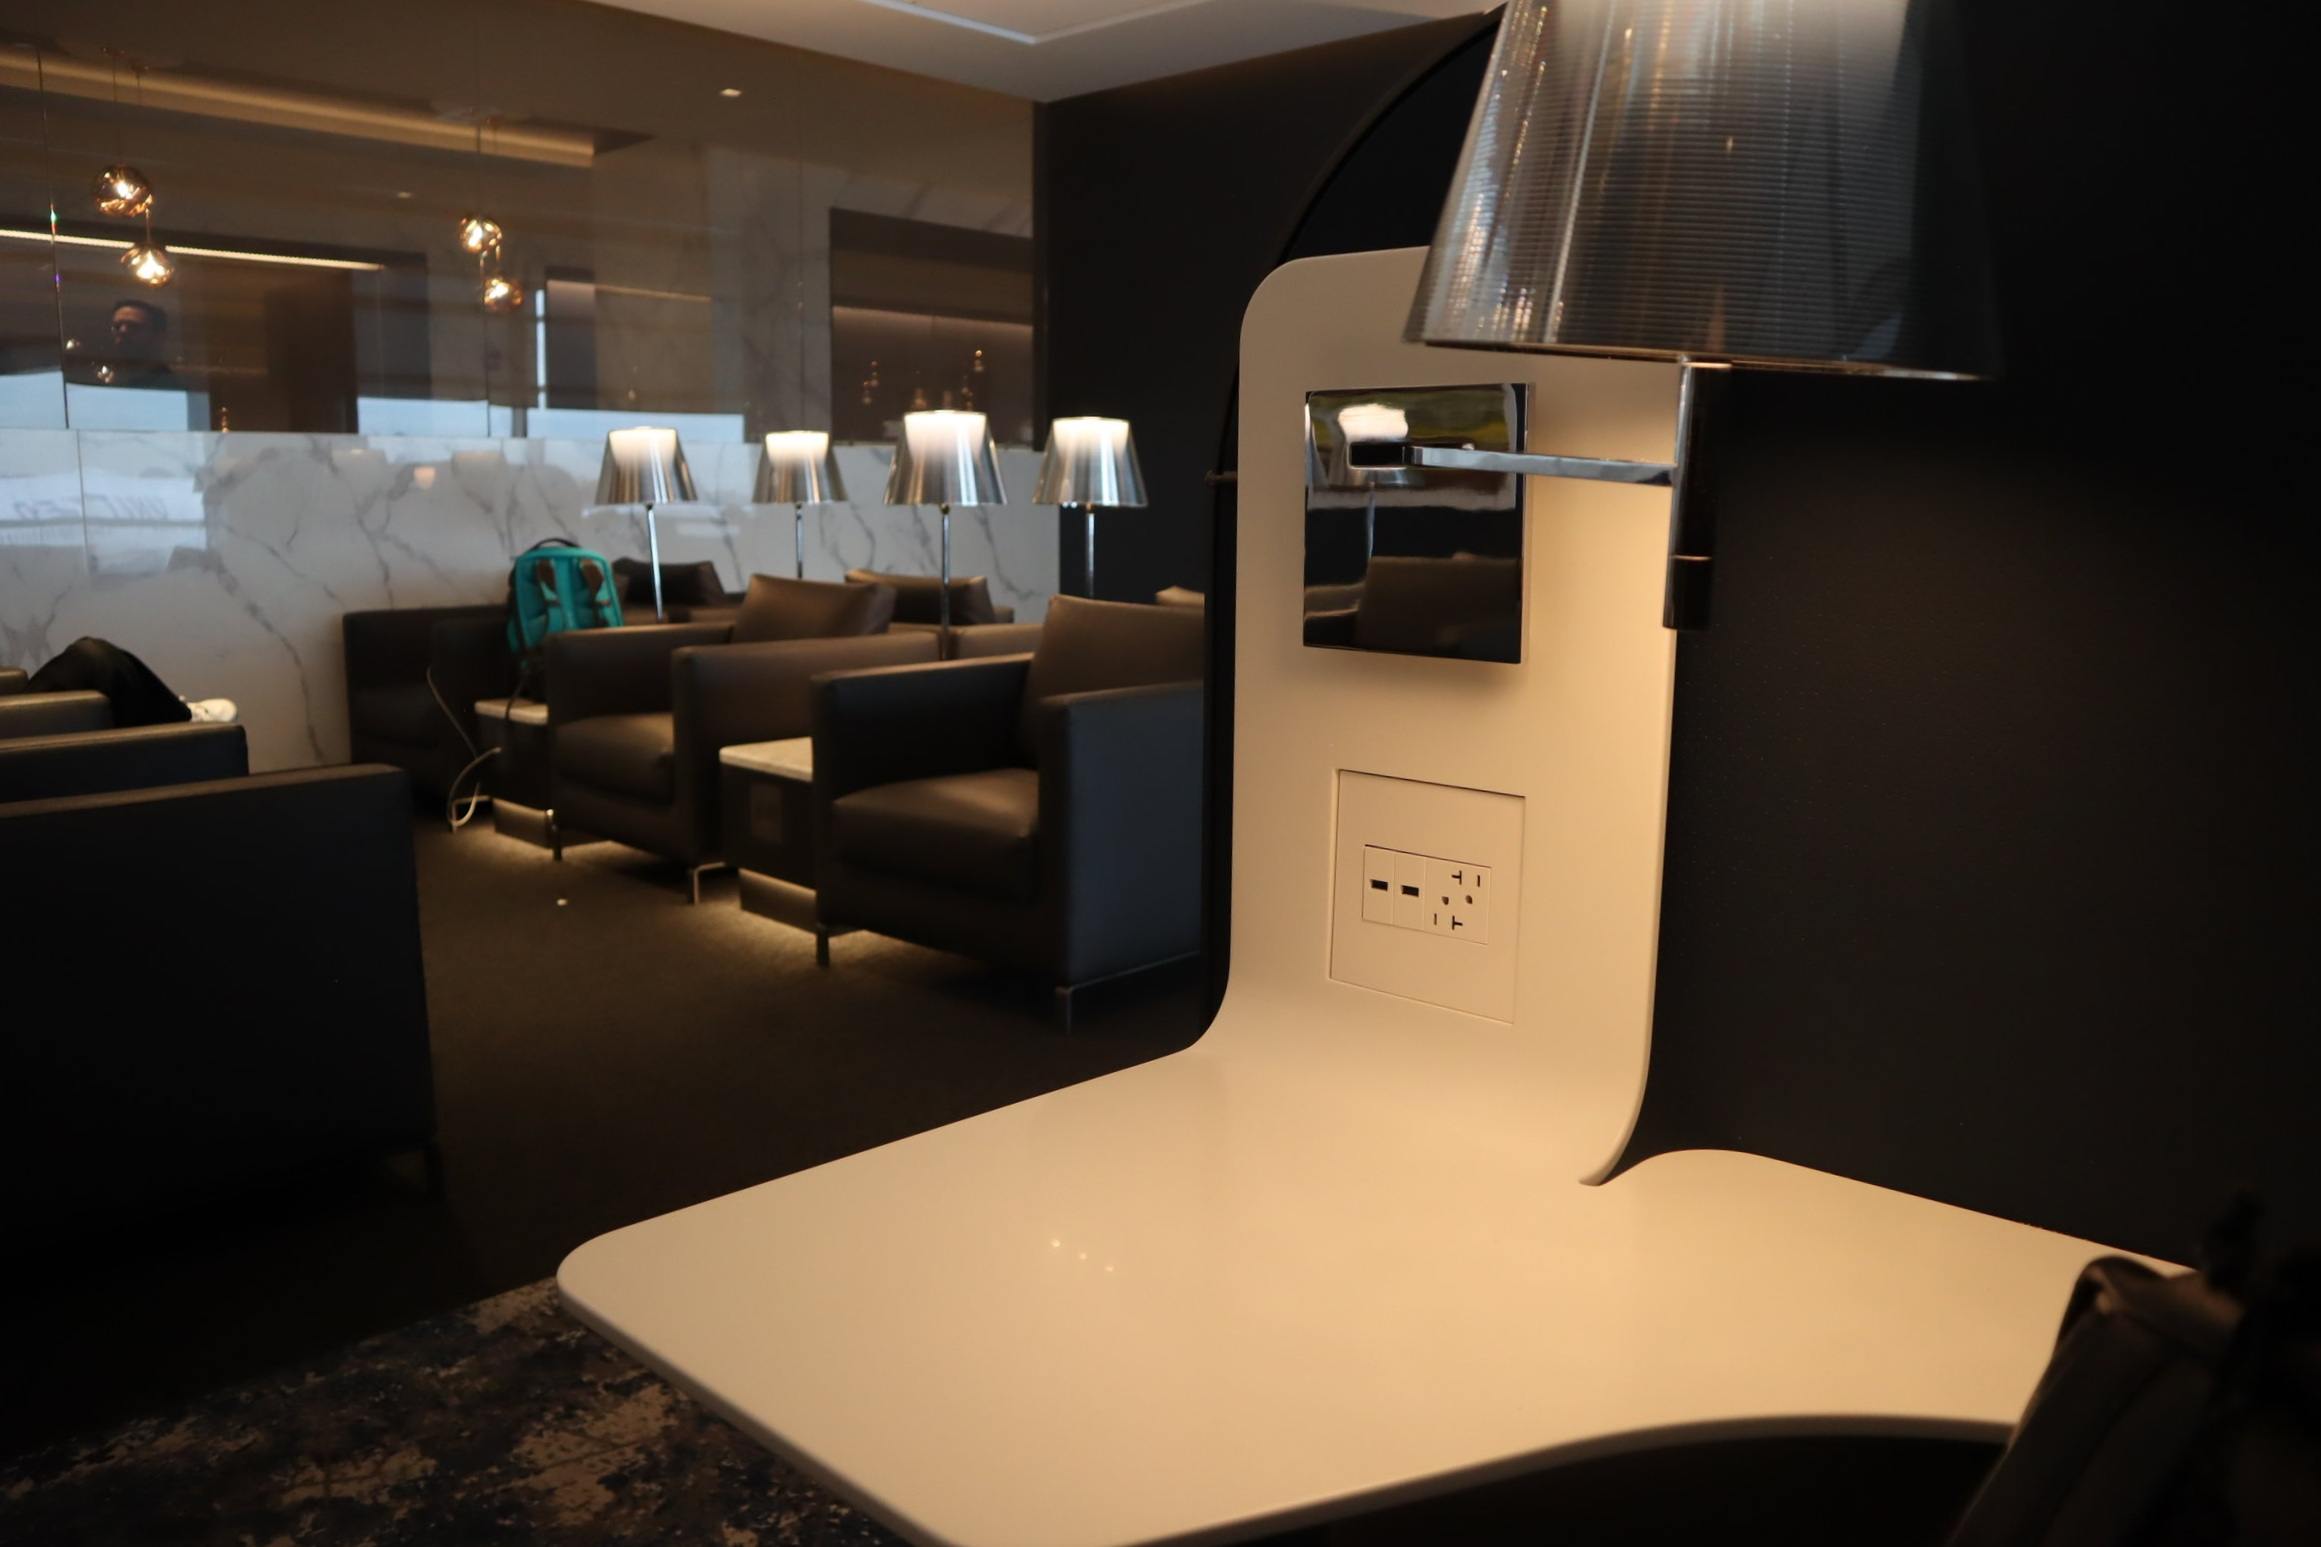 United Polaris Lounge Newark – Seating pod features